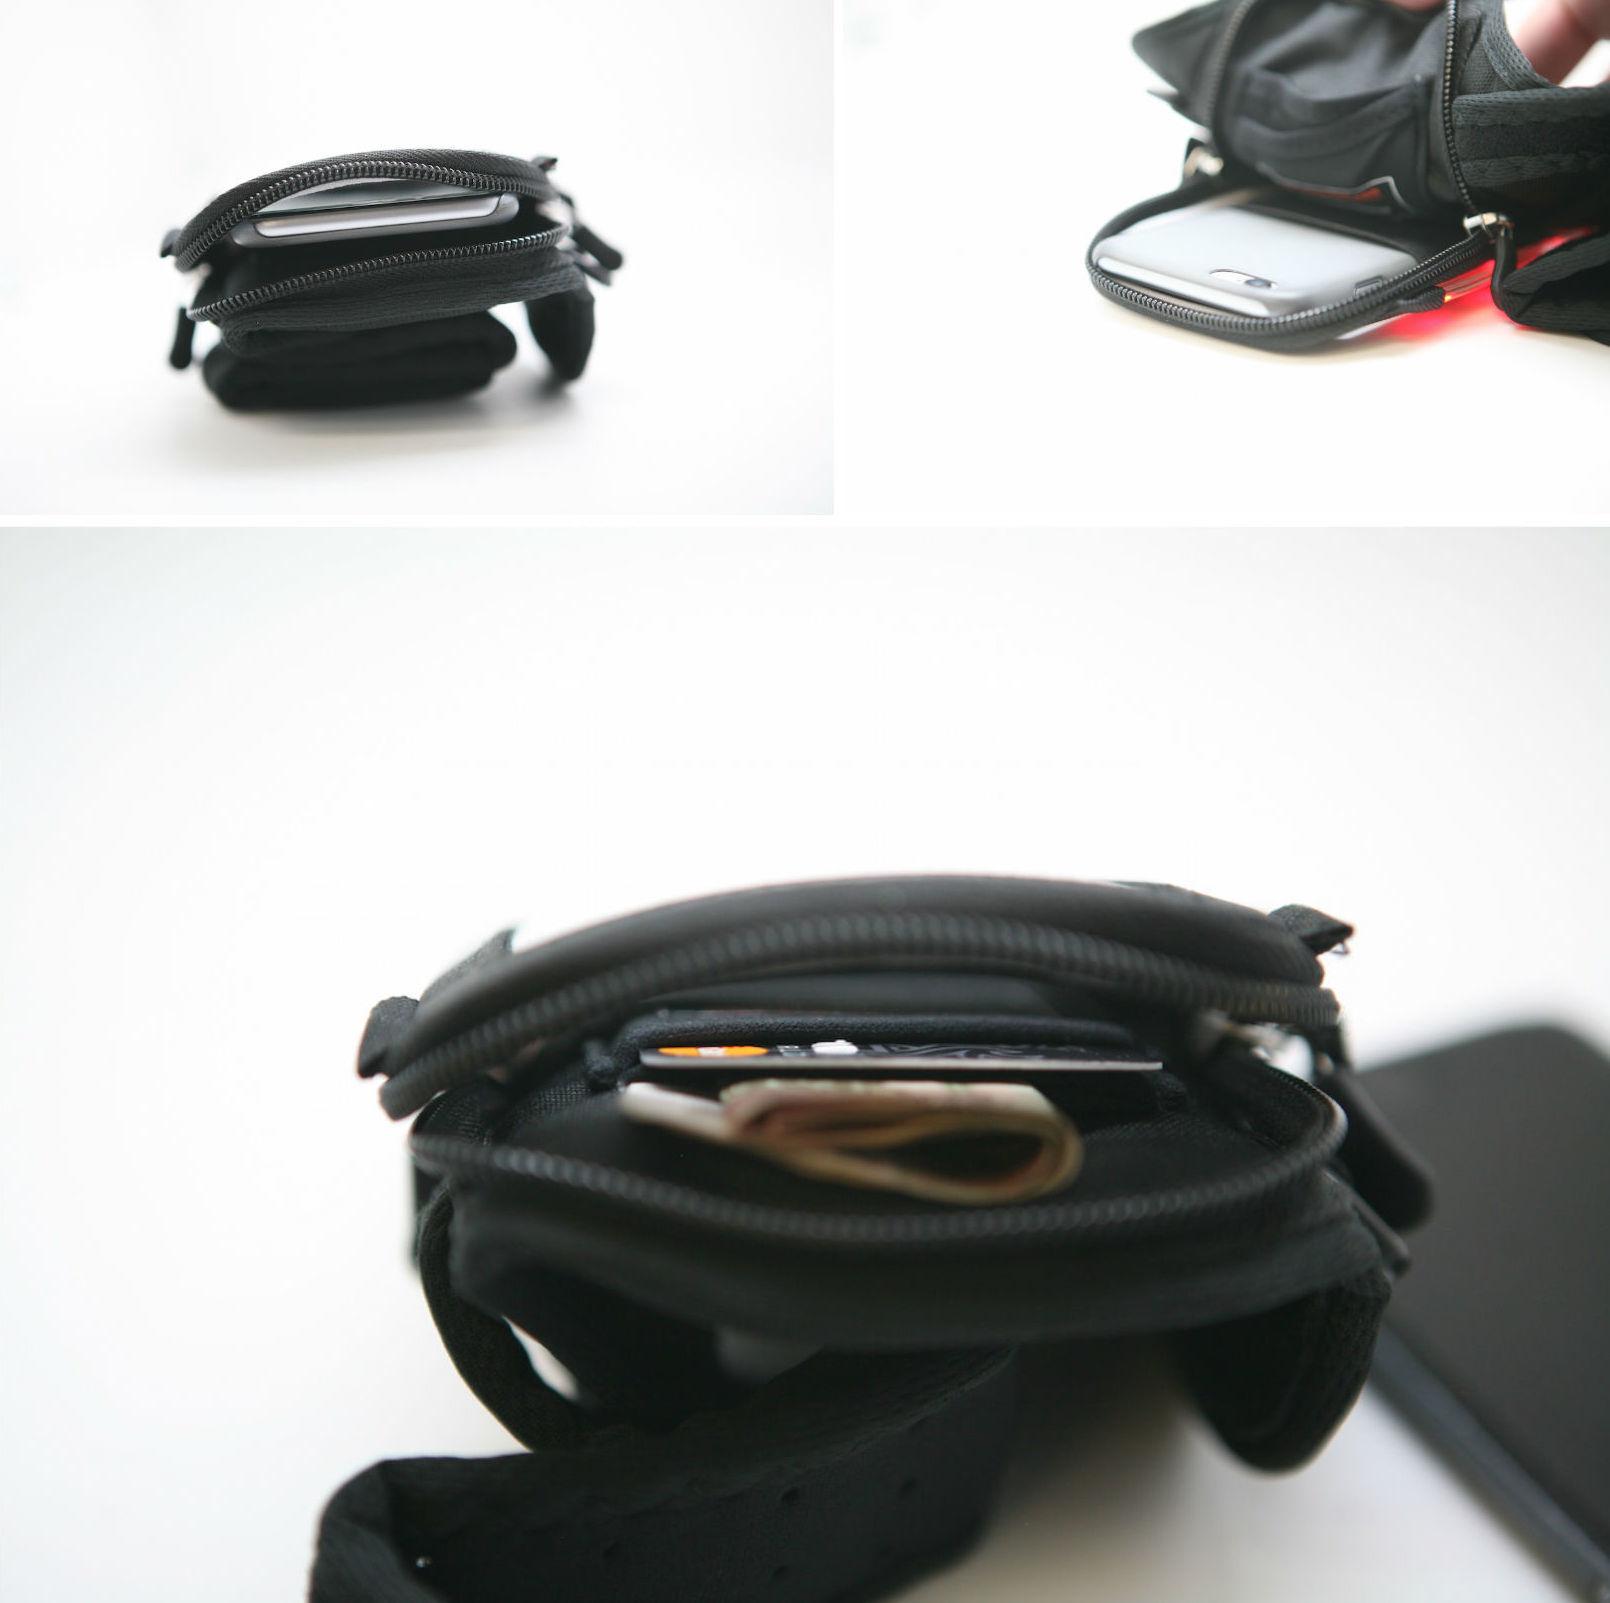 Сверкающий чехол для смартфонов: знакомимся с брендом Armpocket - 4